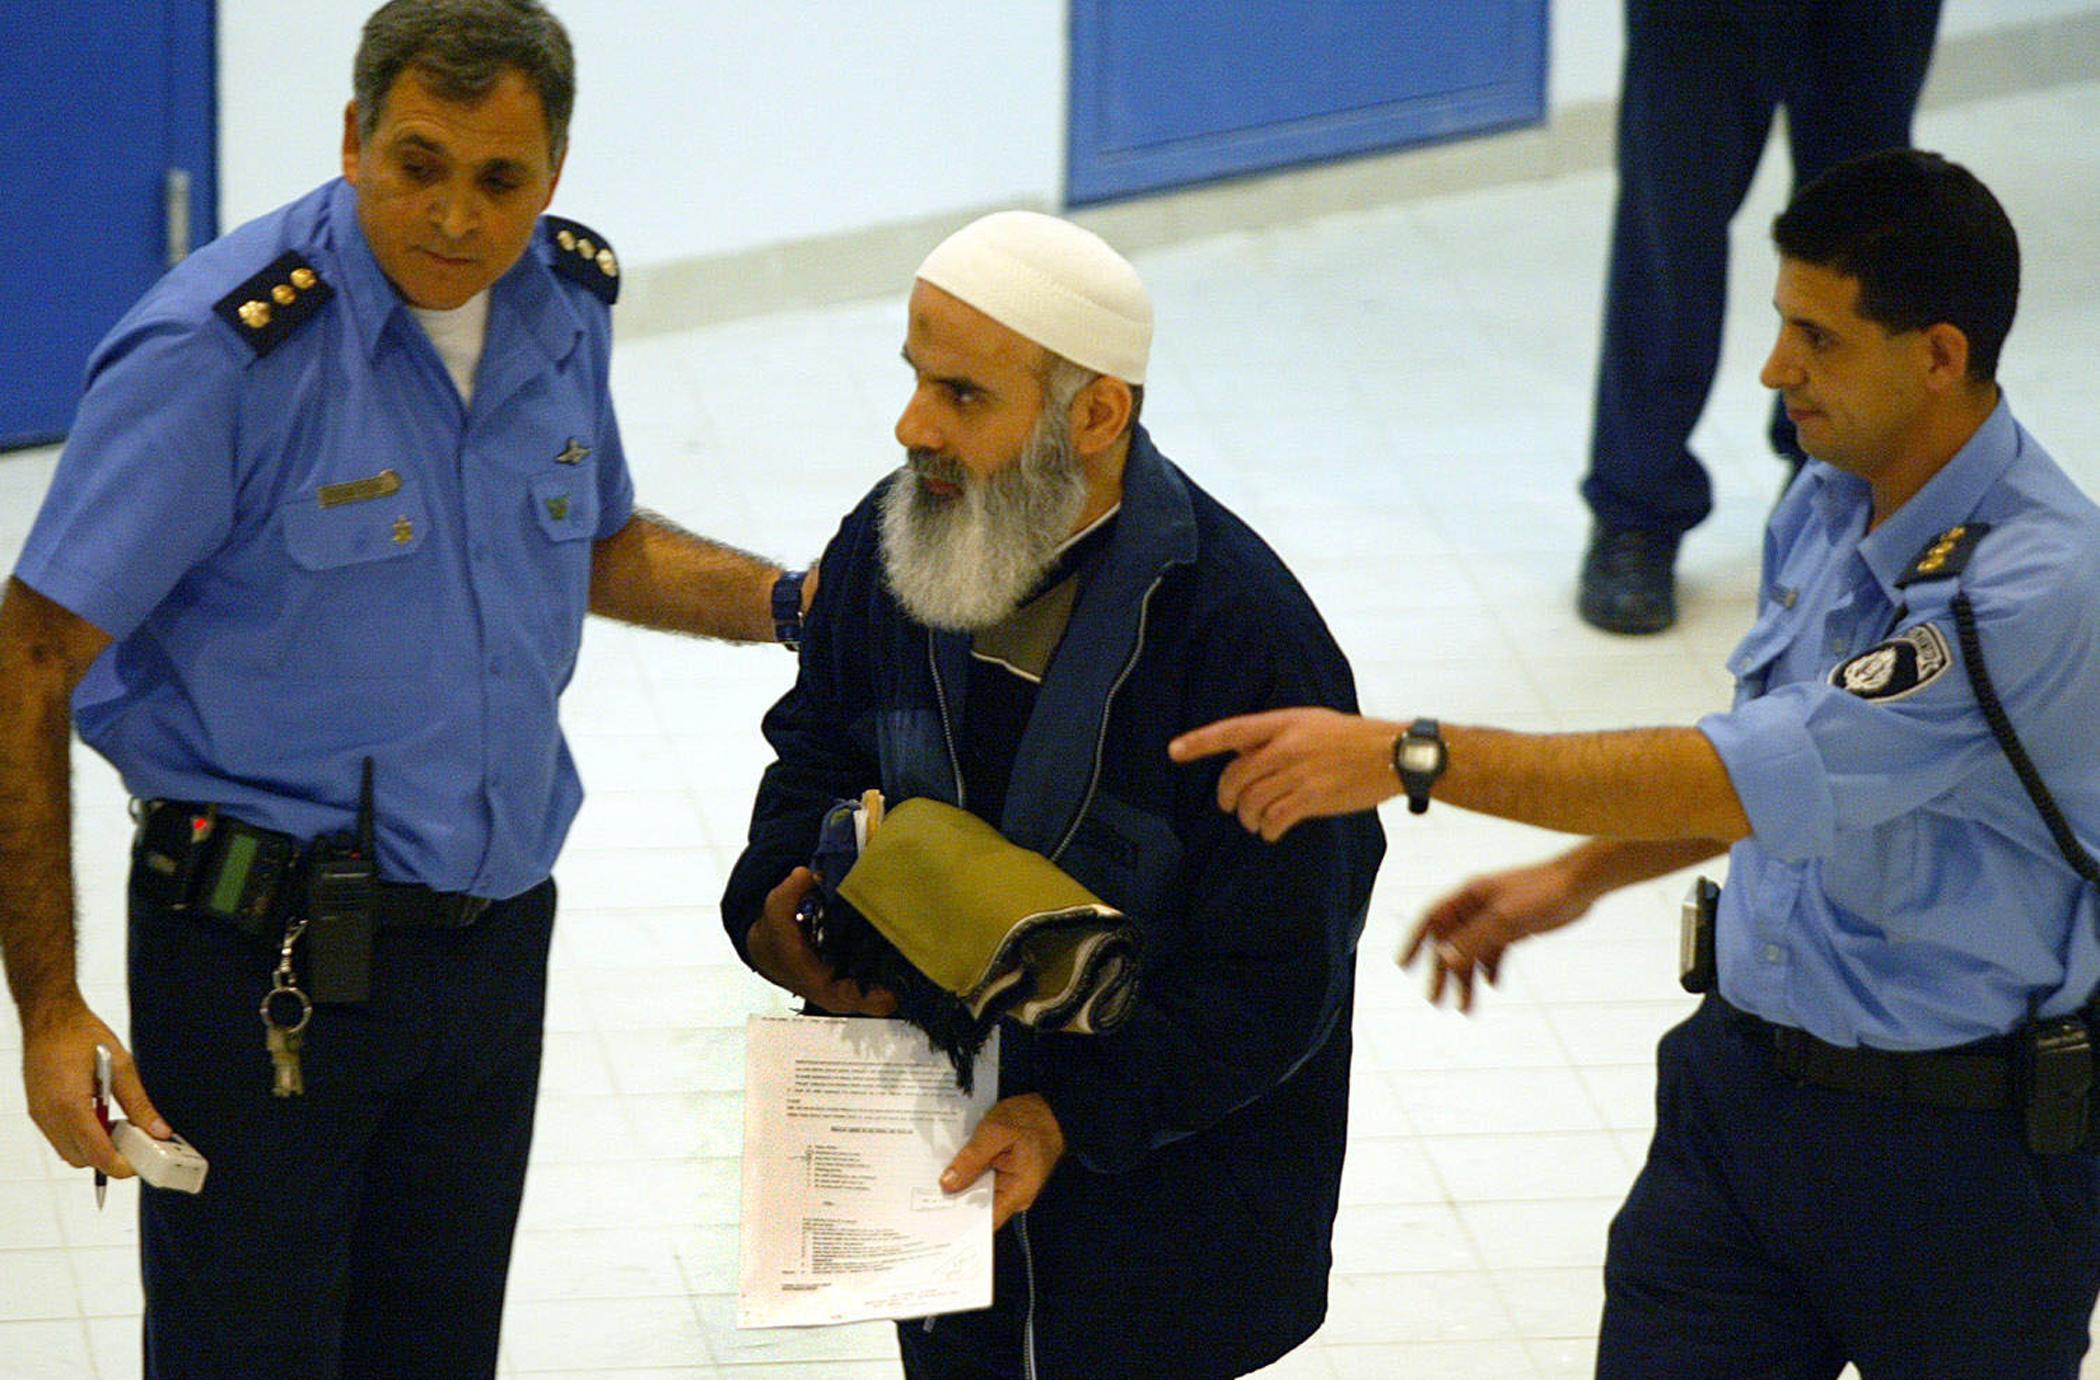 Airport security handling Muslim